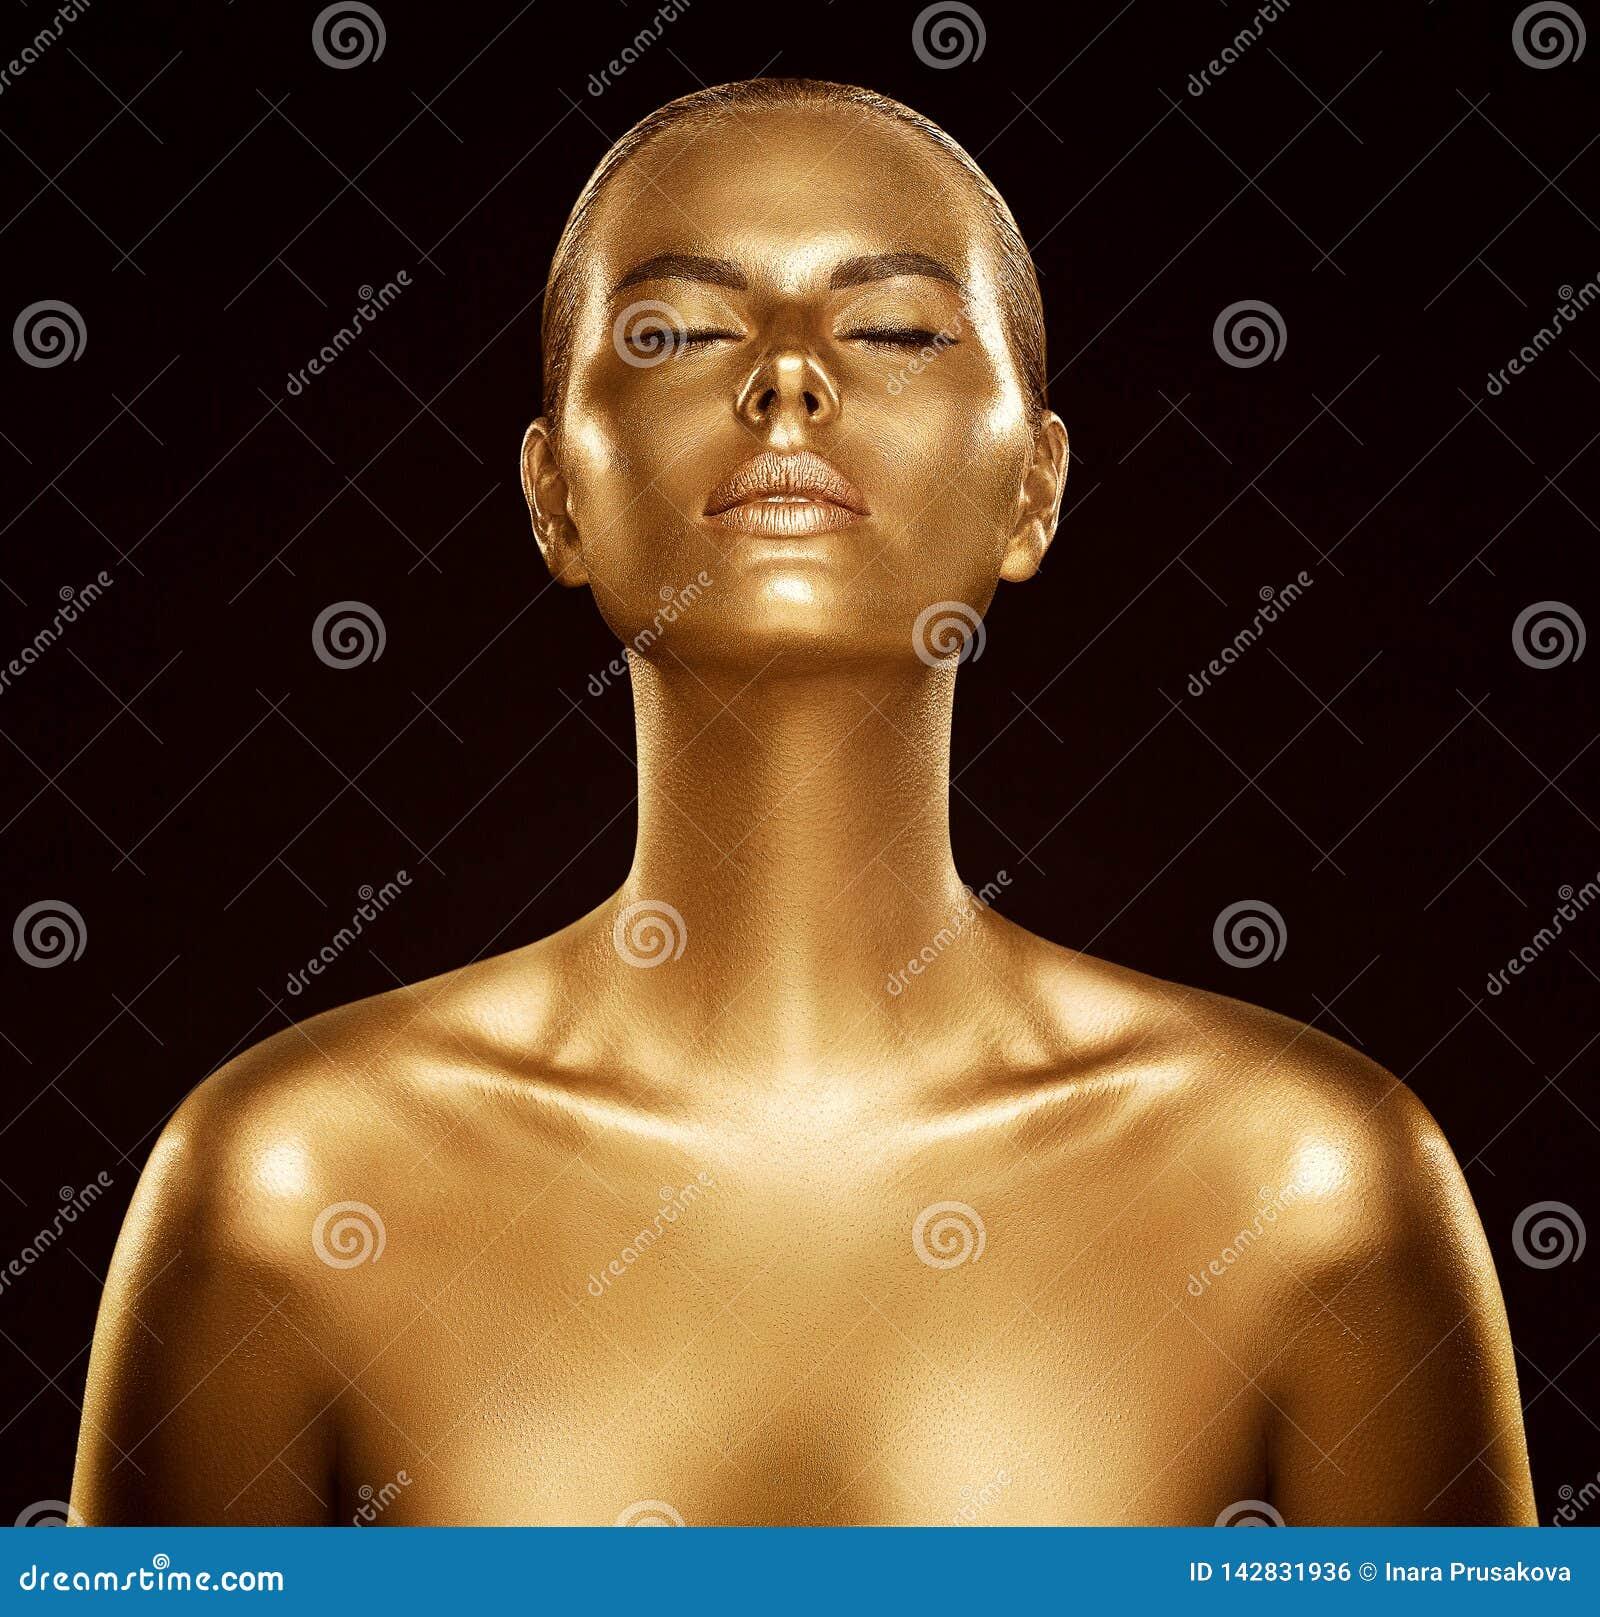 Frauen-Goldhaut, Mode-Modell Golden Body Art, Schönheits-Porträt-Gesicht und Körper-Glanz als Metall